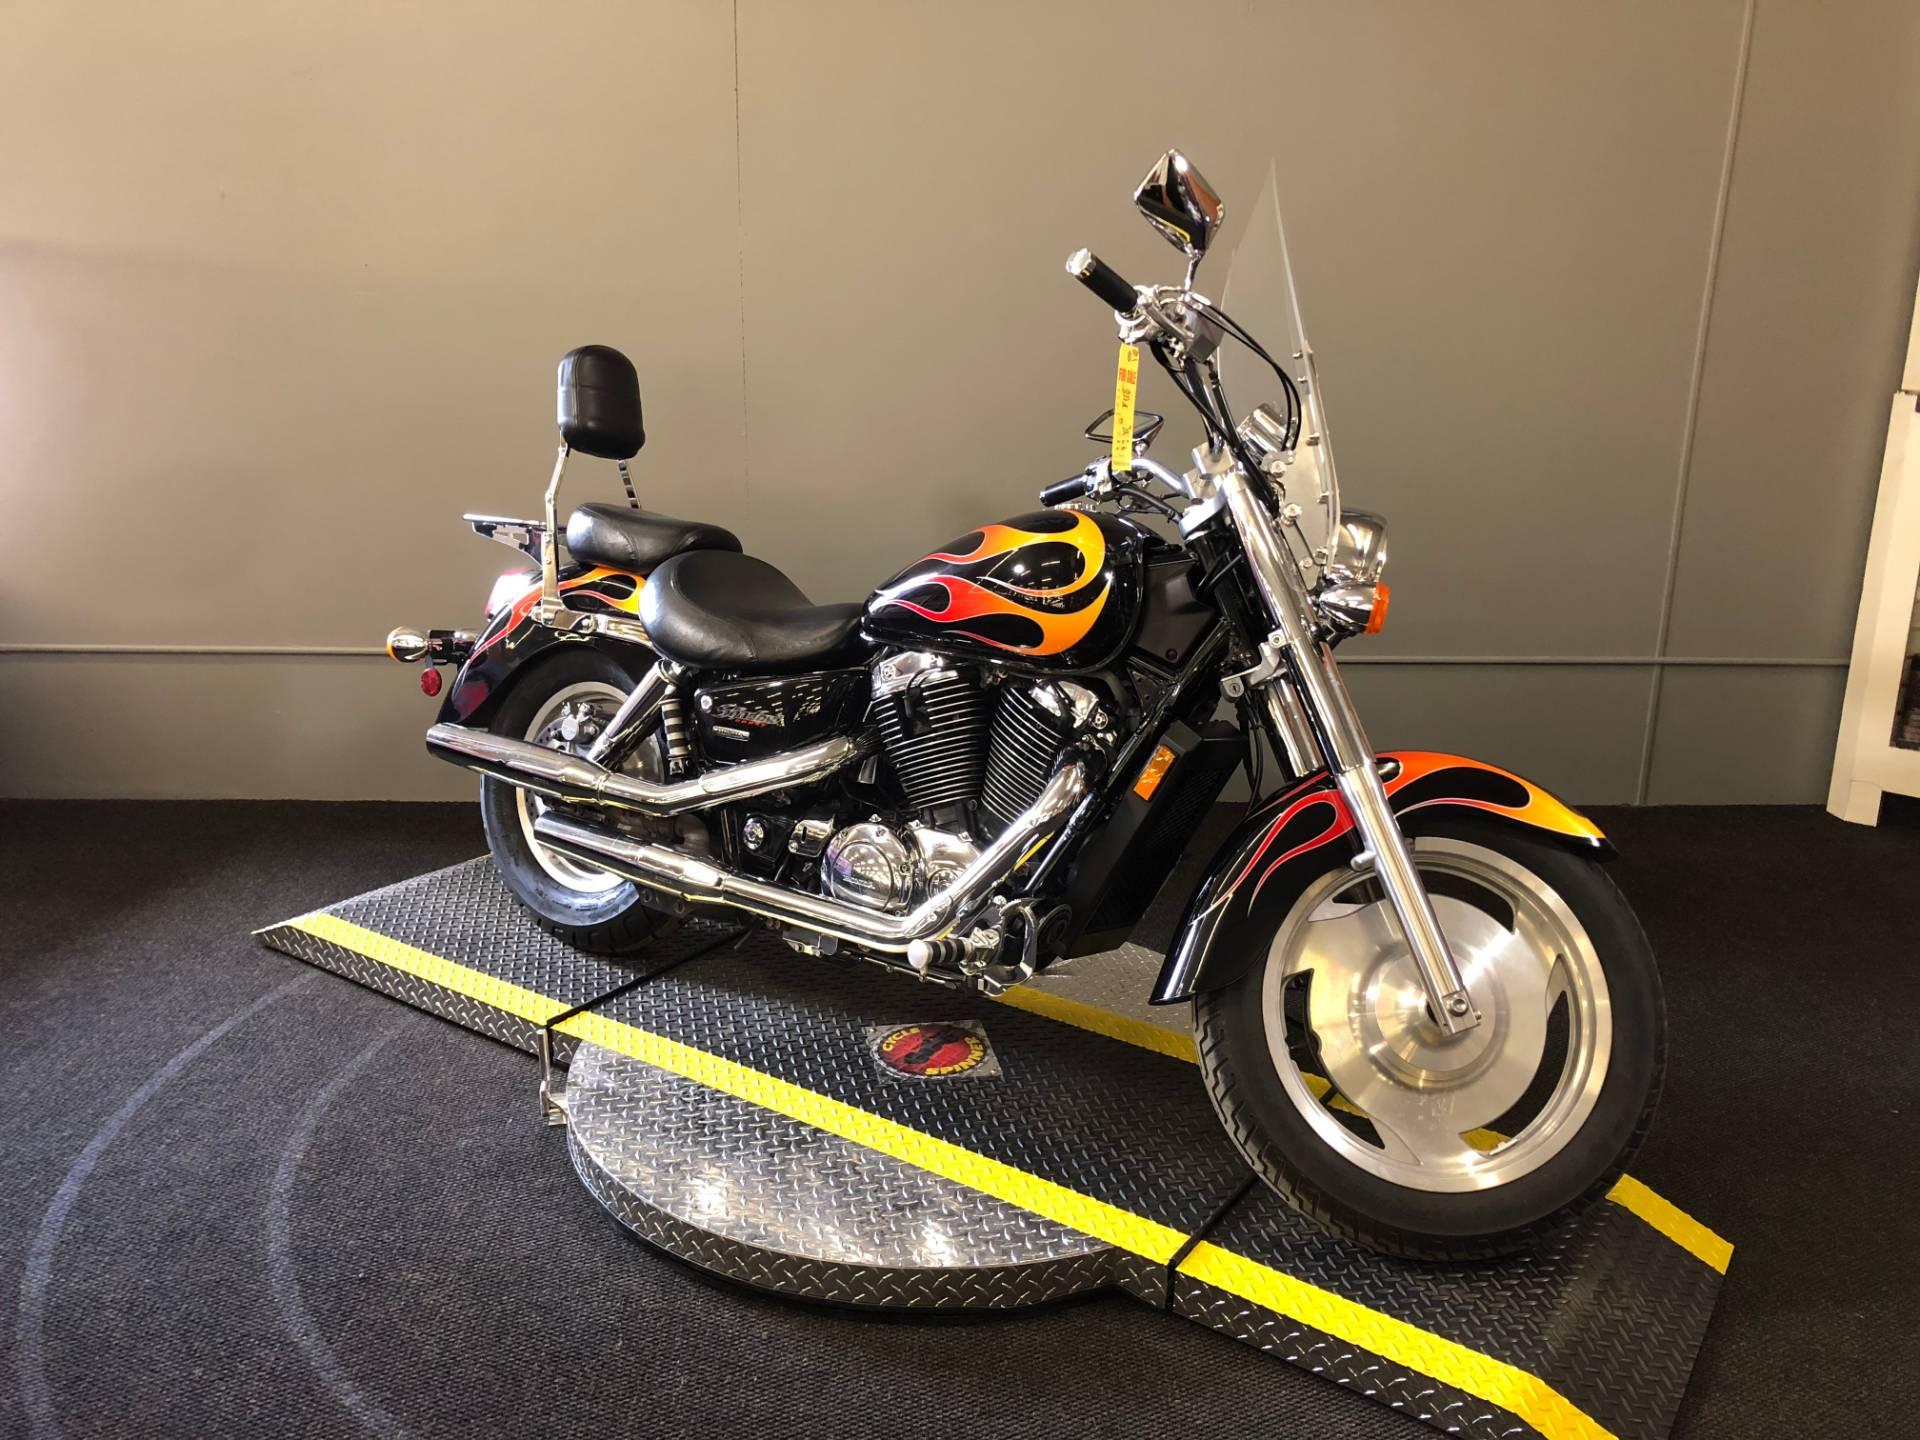 2007 Honda Shadow Sabre Motorcycles Tyrone Pennsylvania